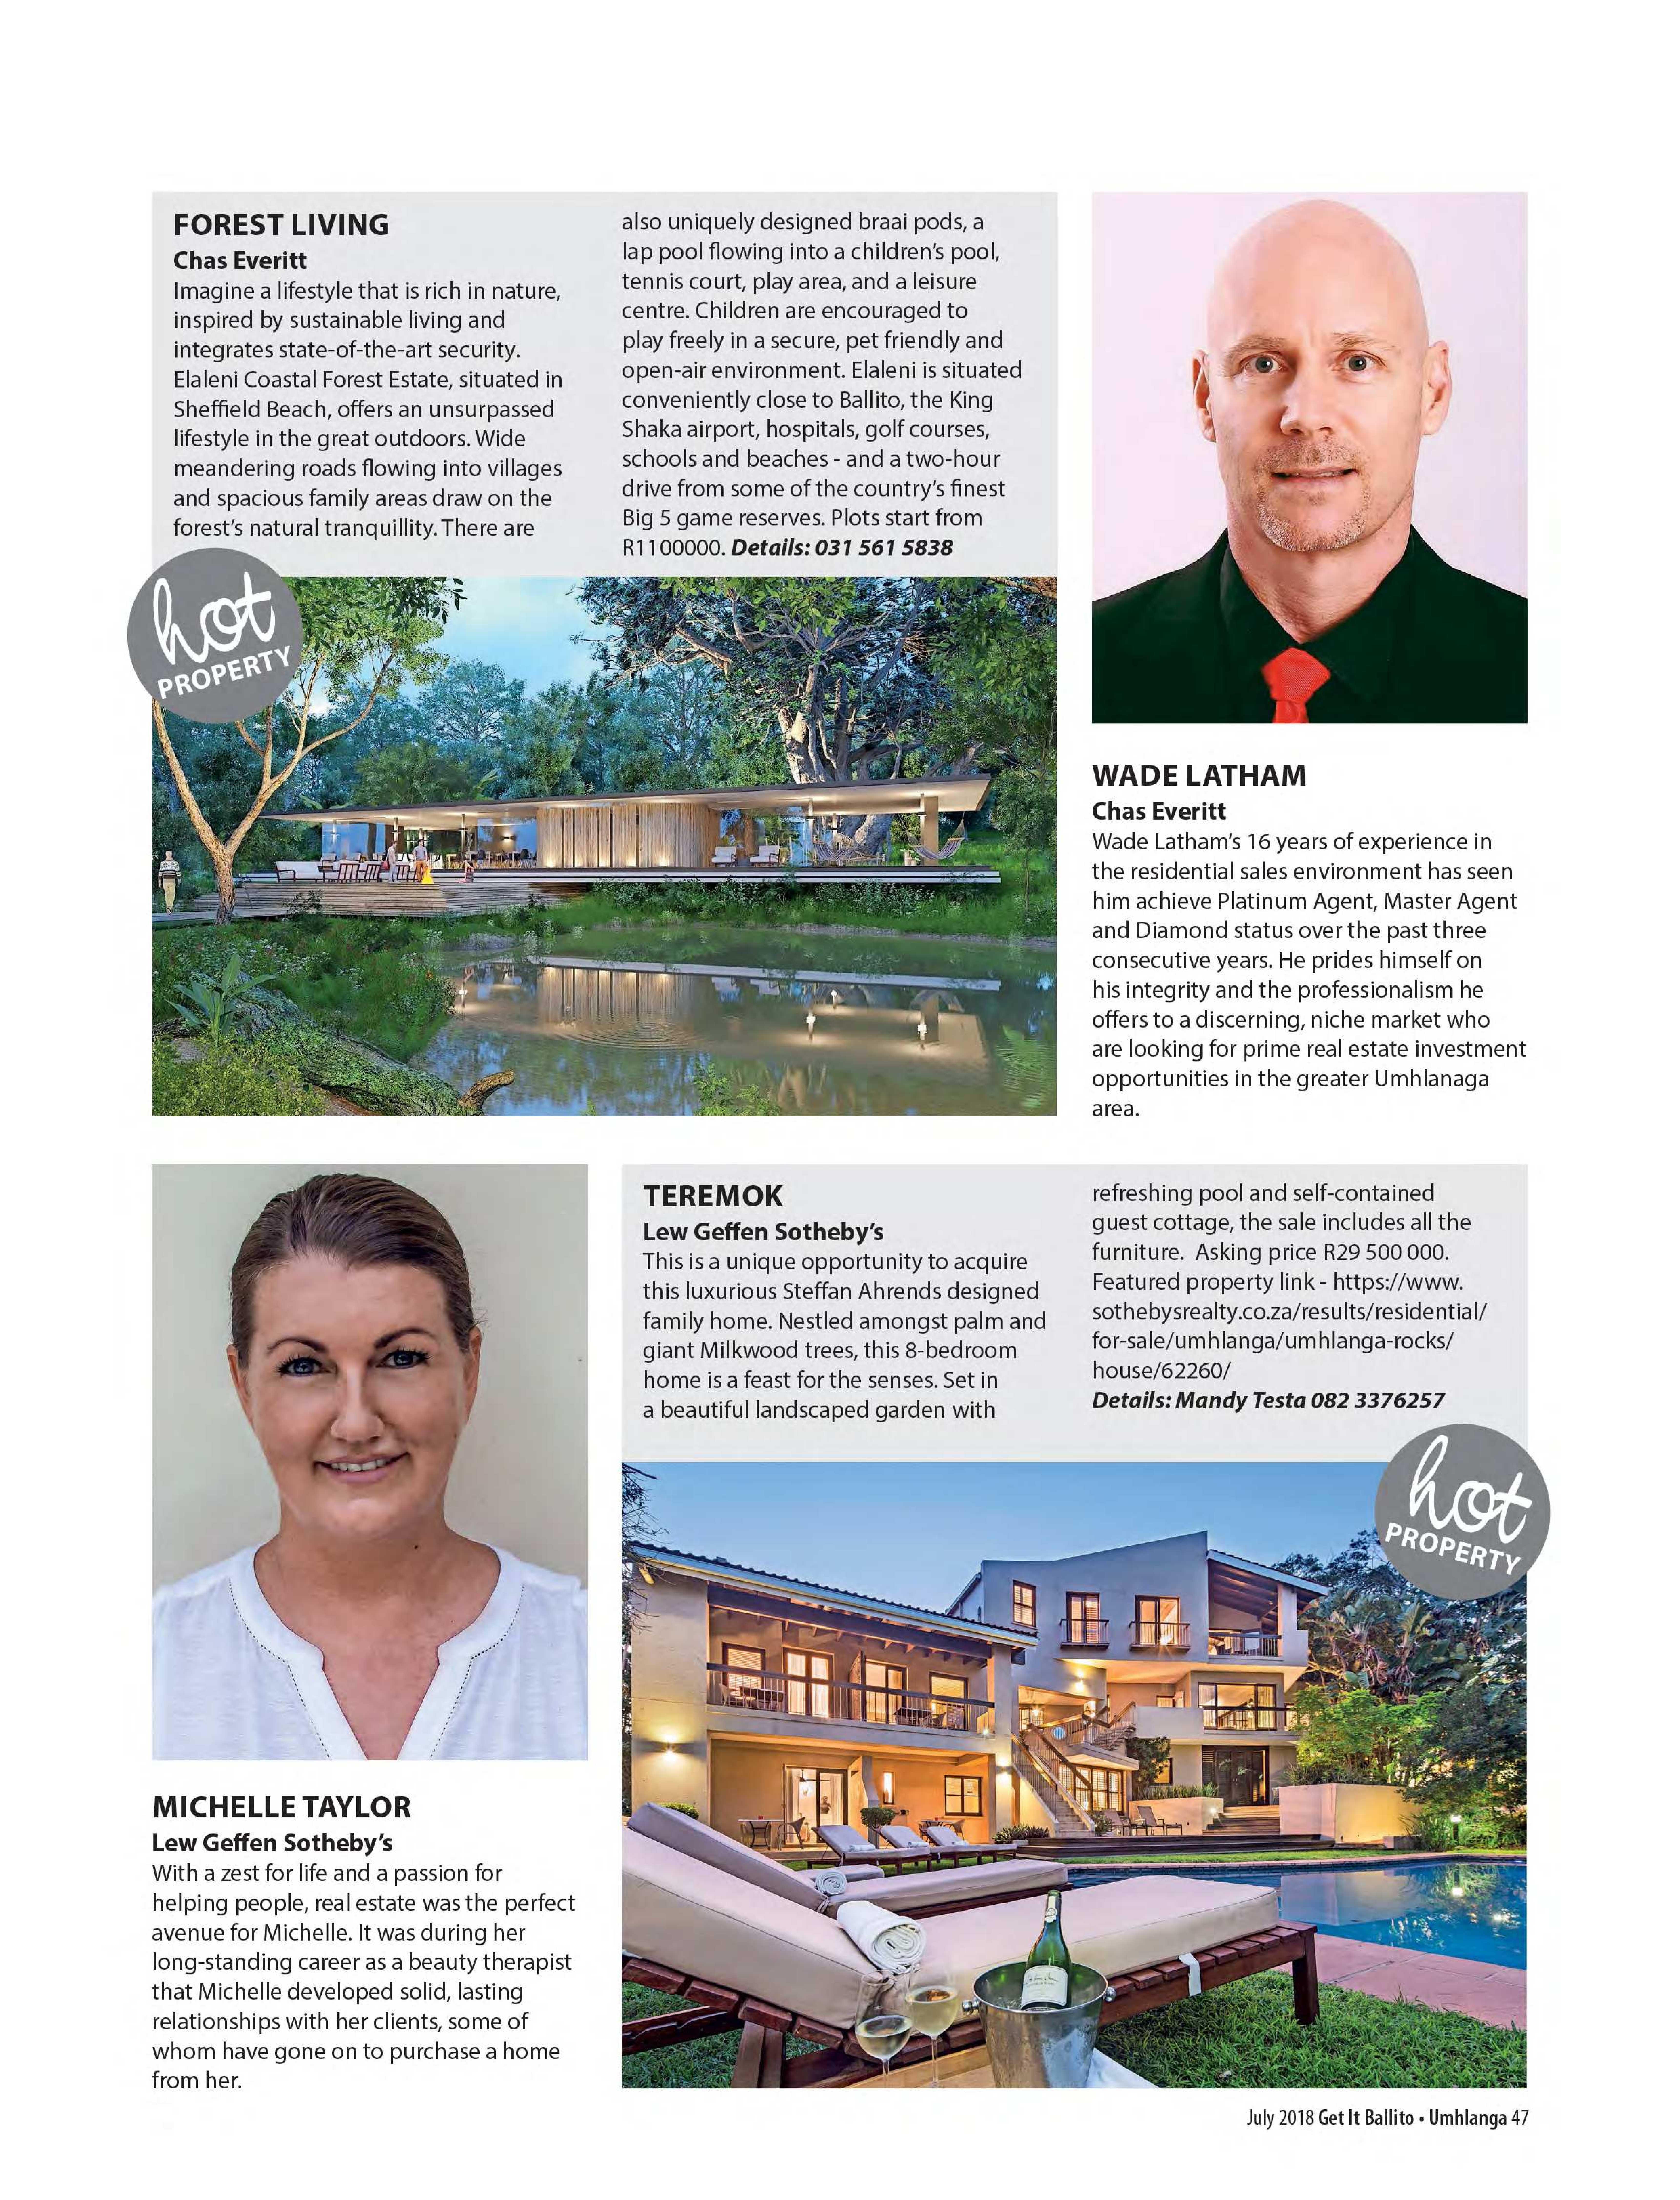 get-magazine-ballitoumhlanga-july-2018-epapers-page-49